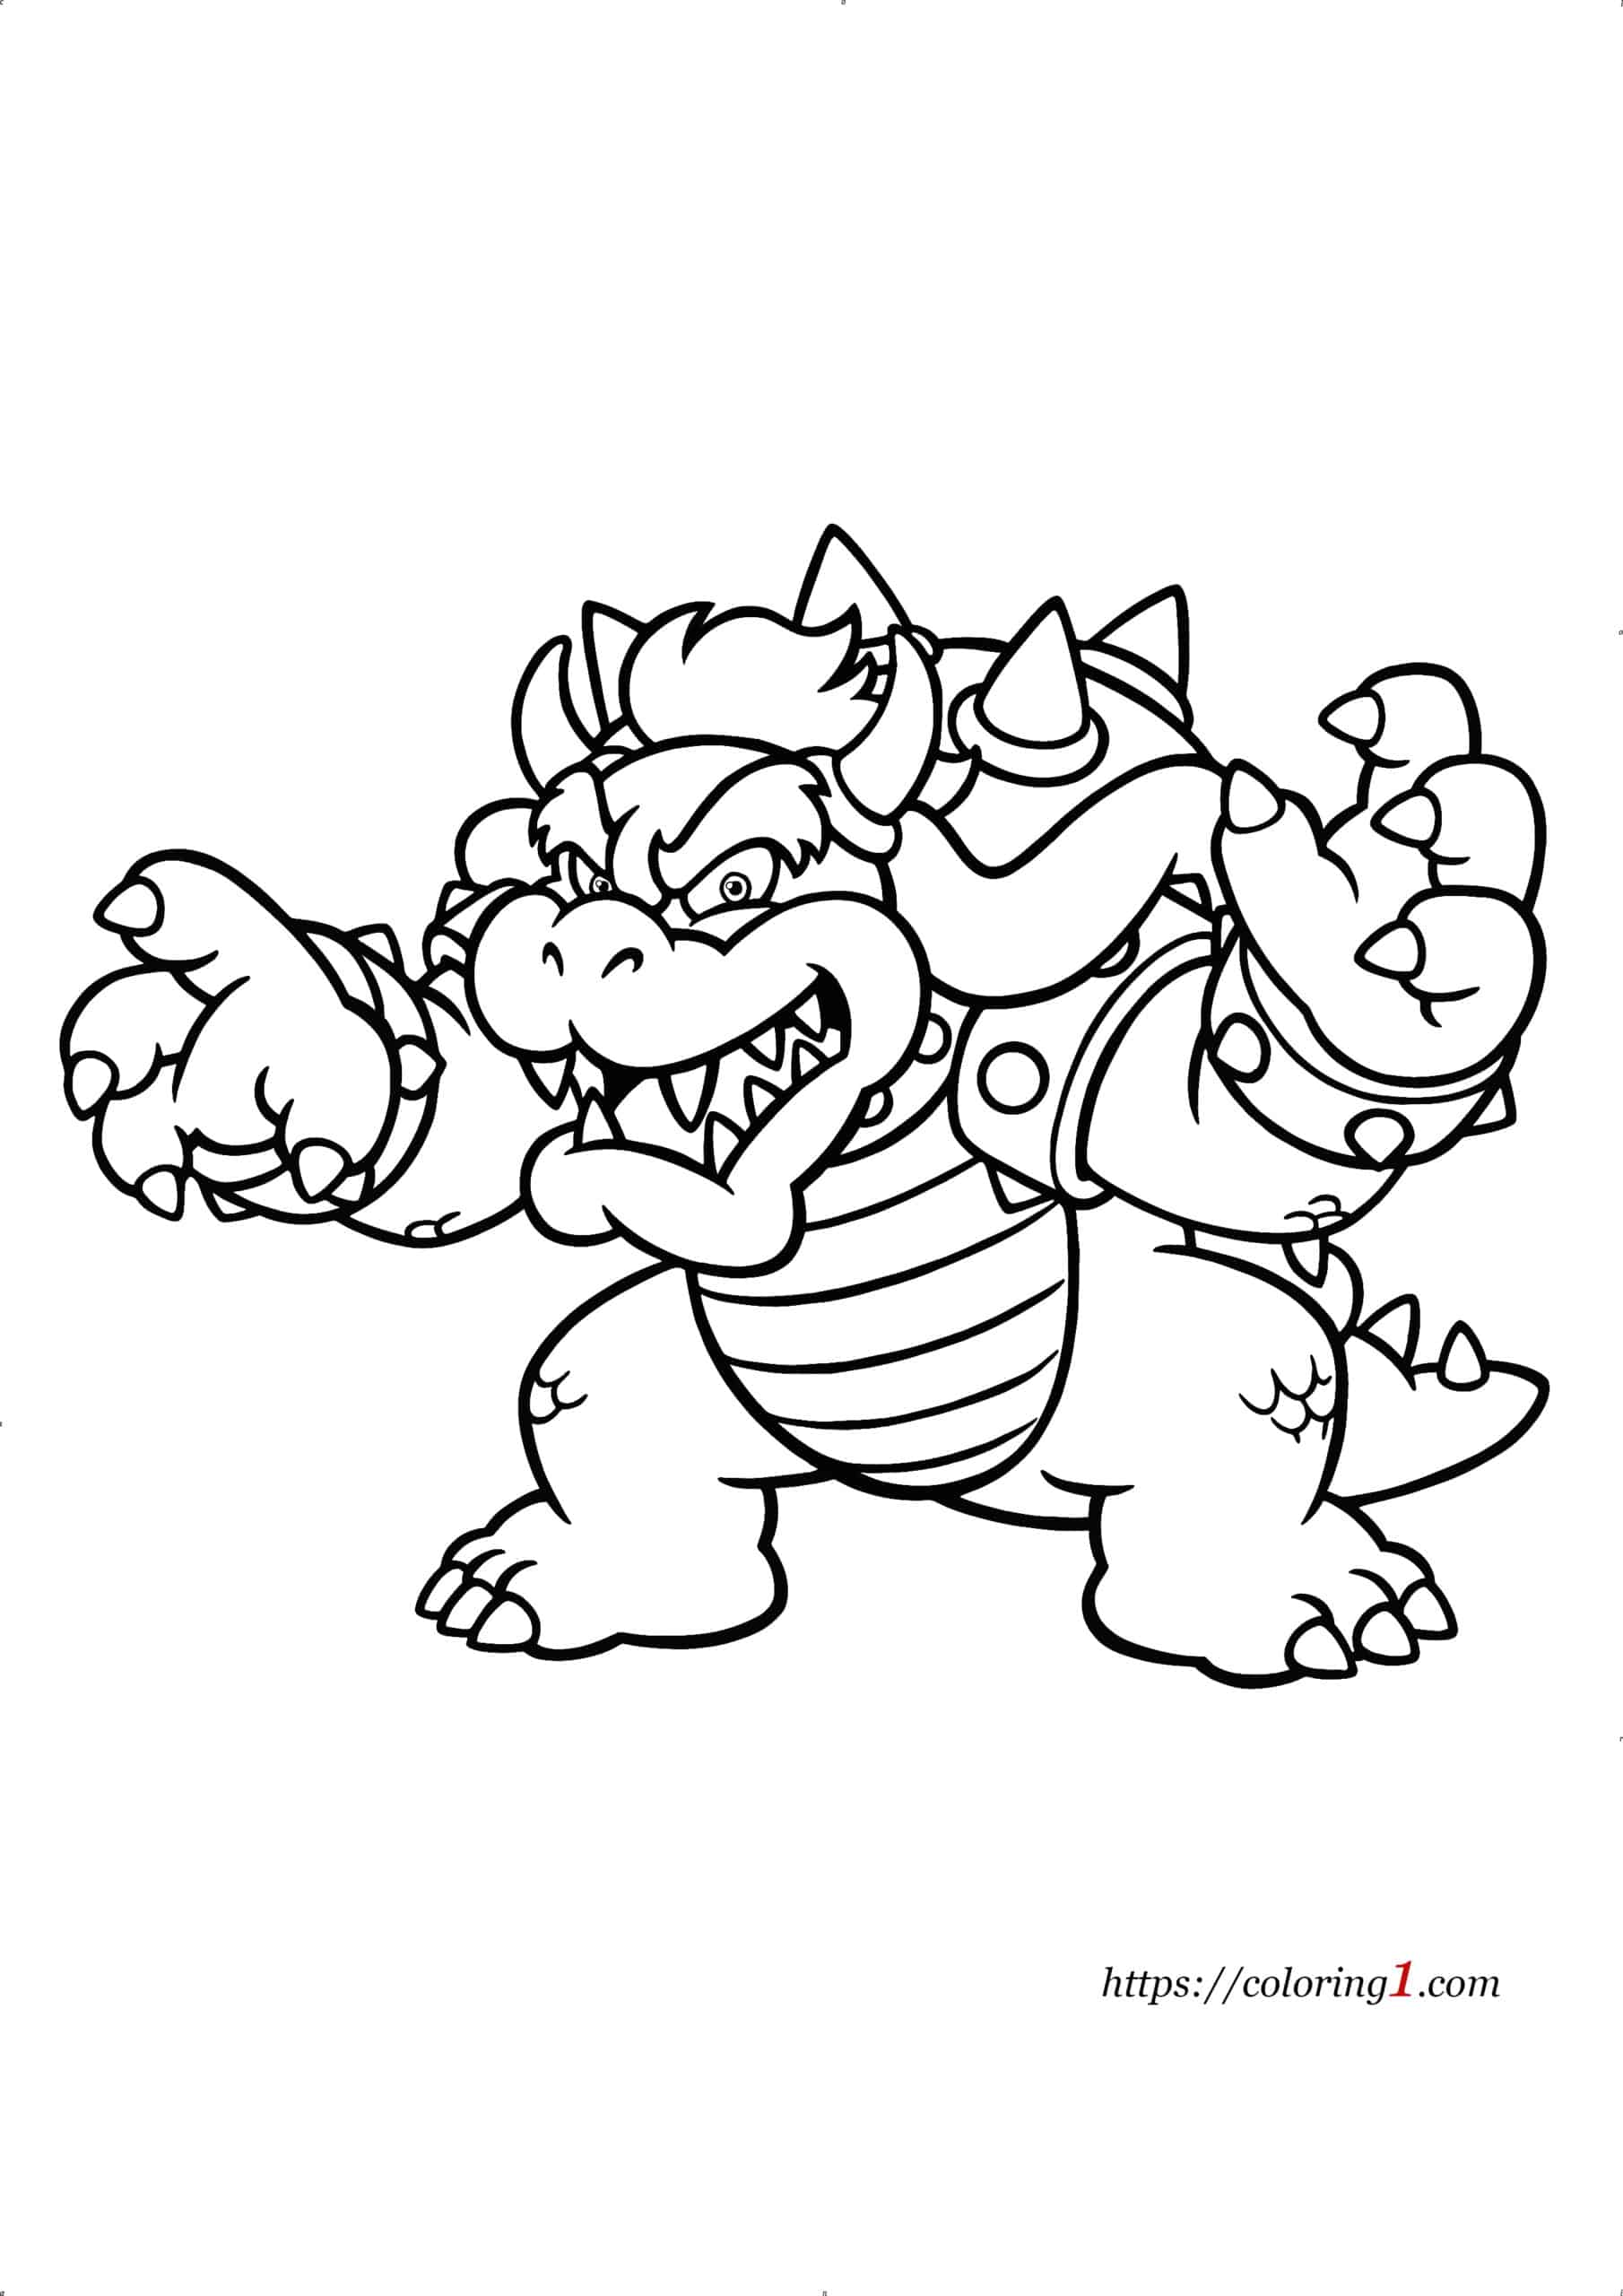 Coloriage Mario Bowser